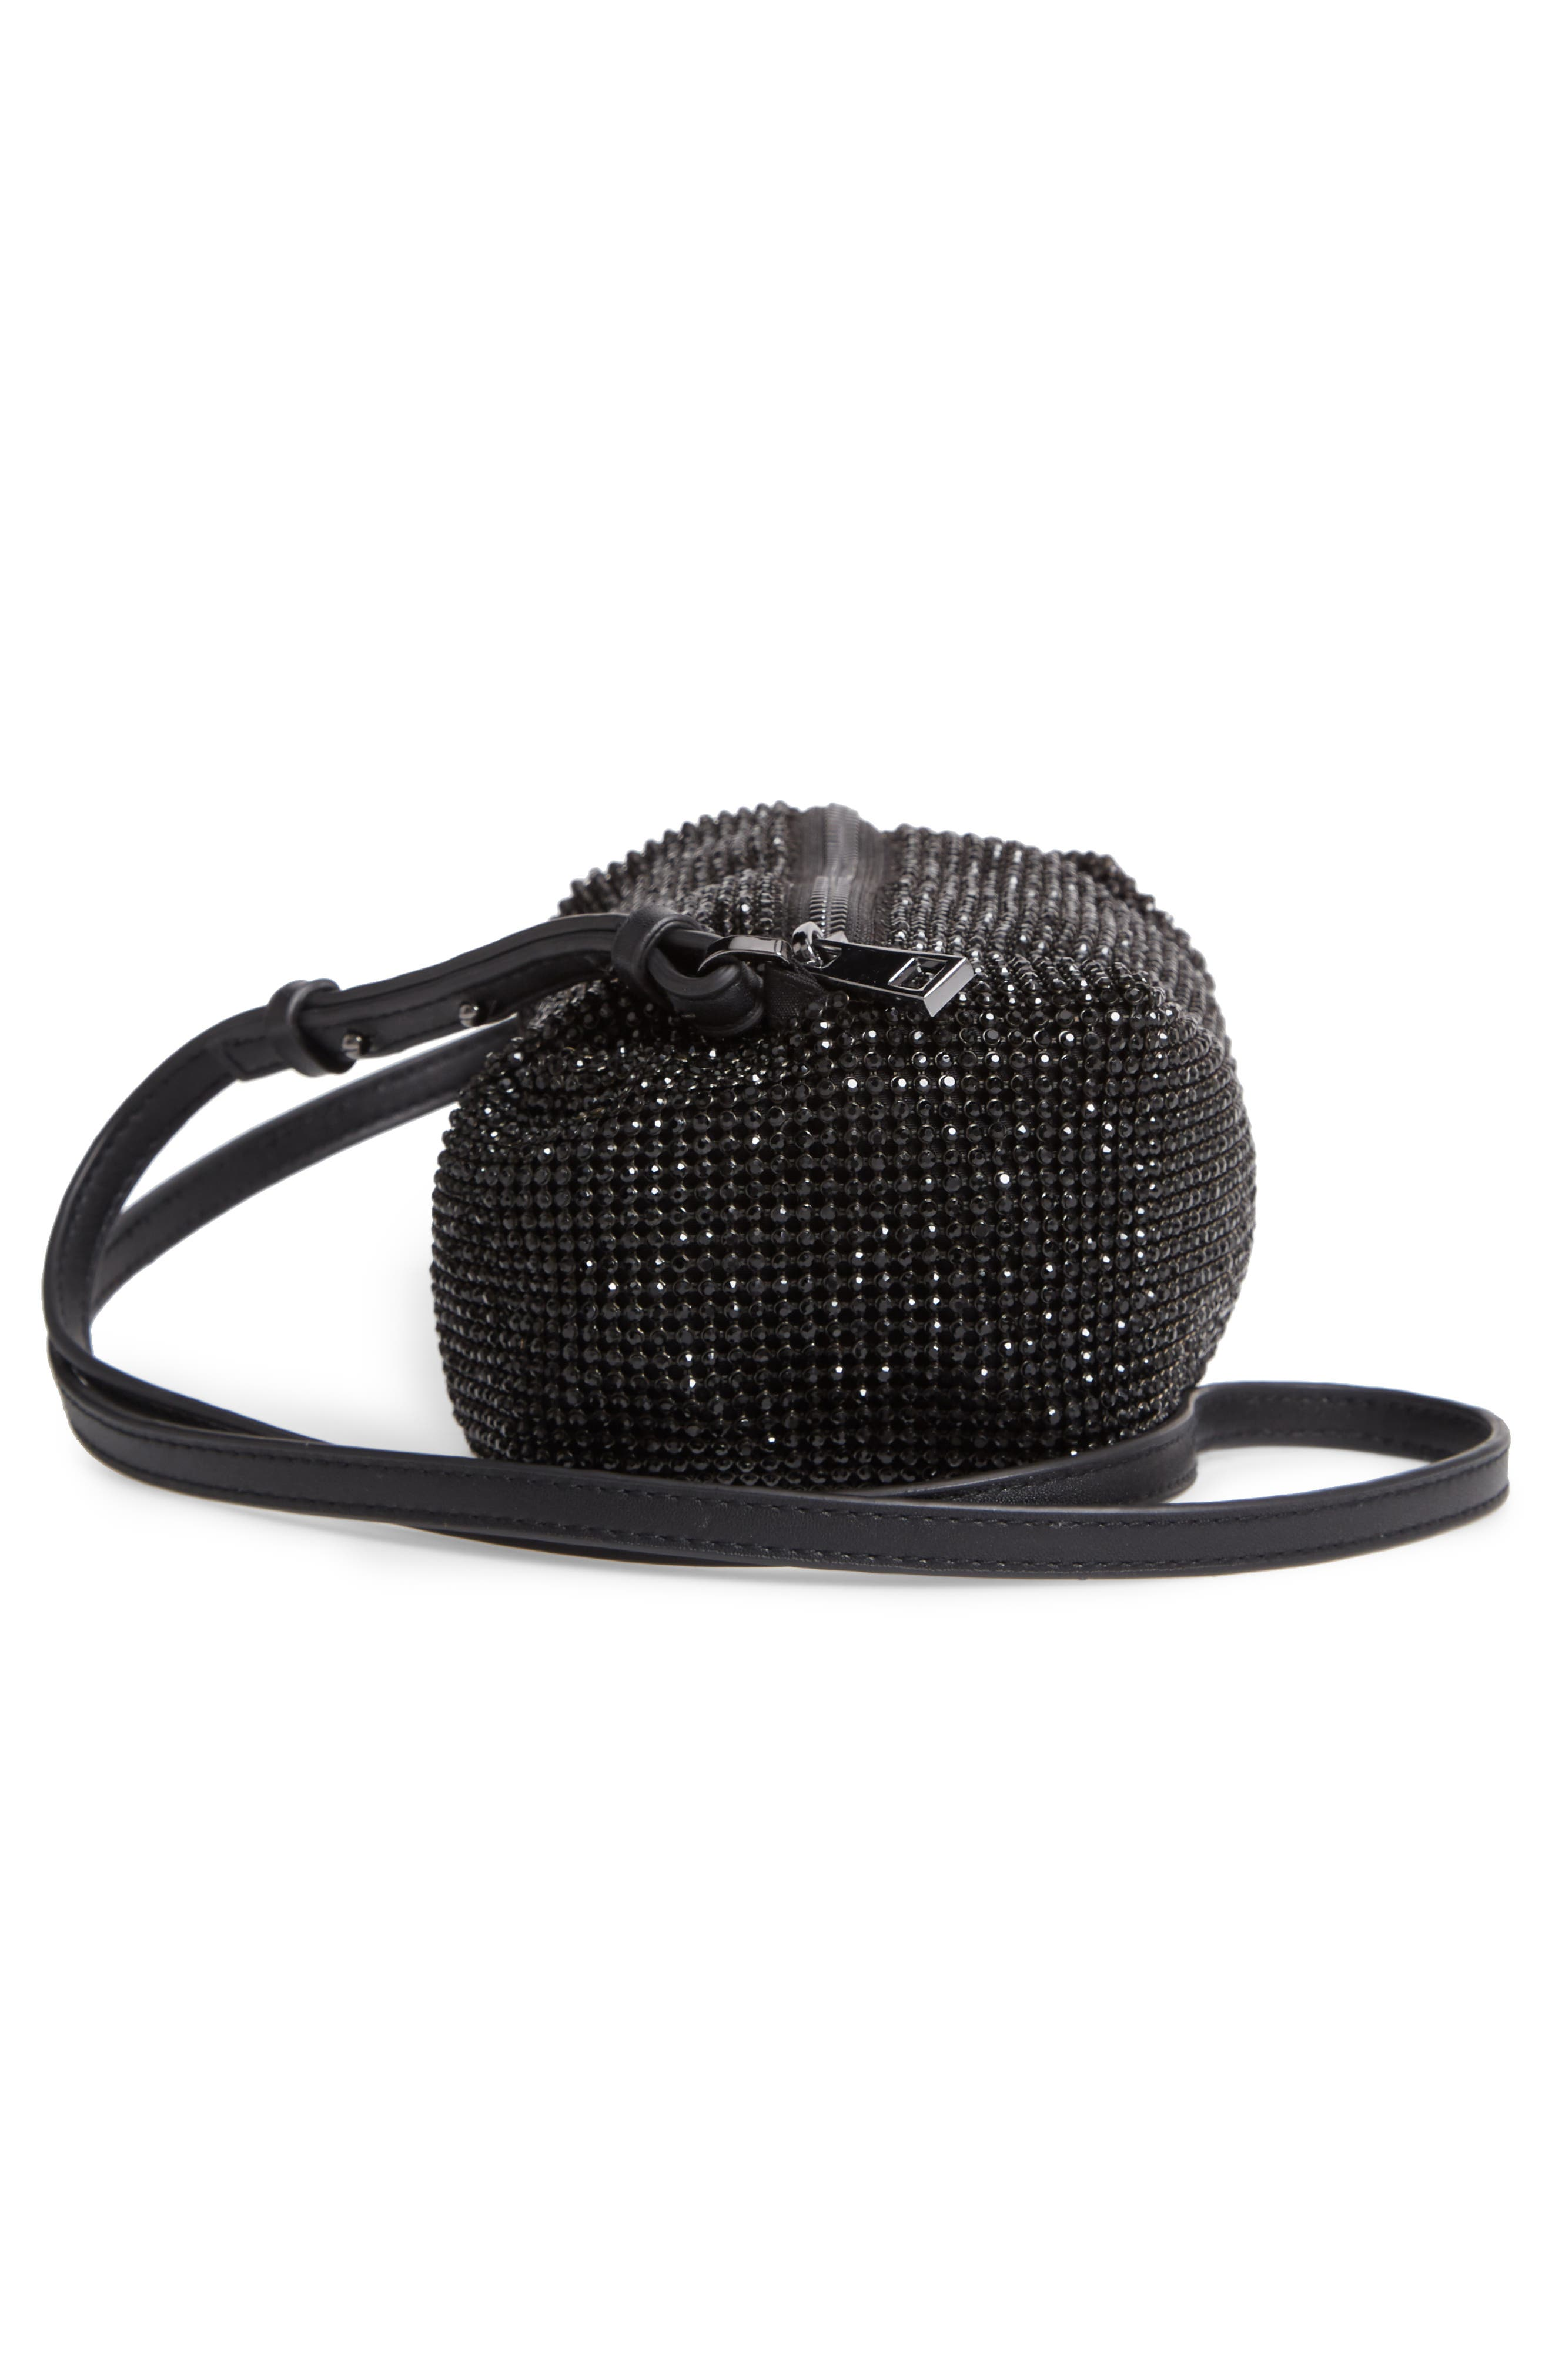 Chia Crystal Embellished Crossbody Bag,                             Alternate thumbnail 5, color,                             BLACK